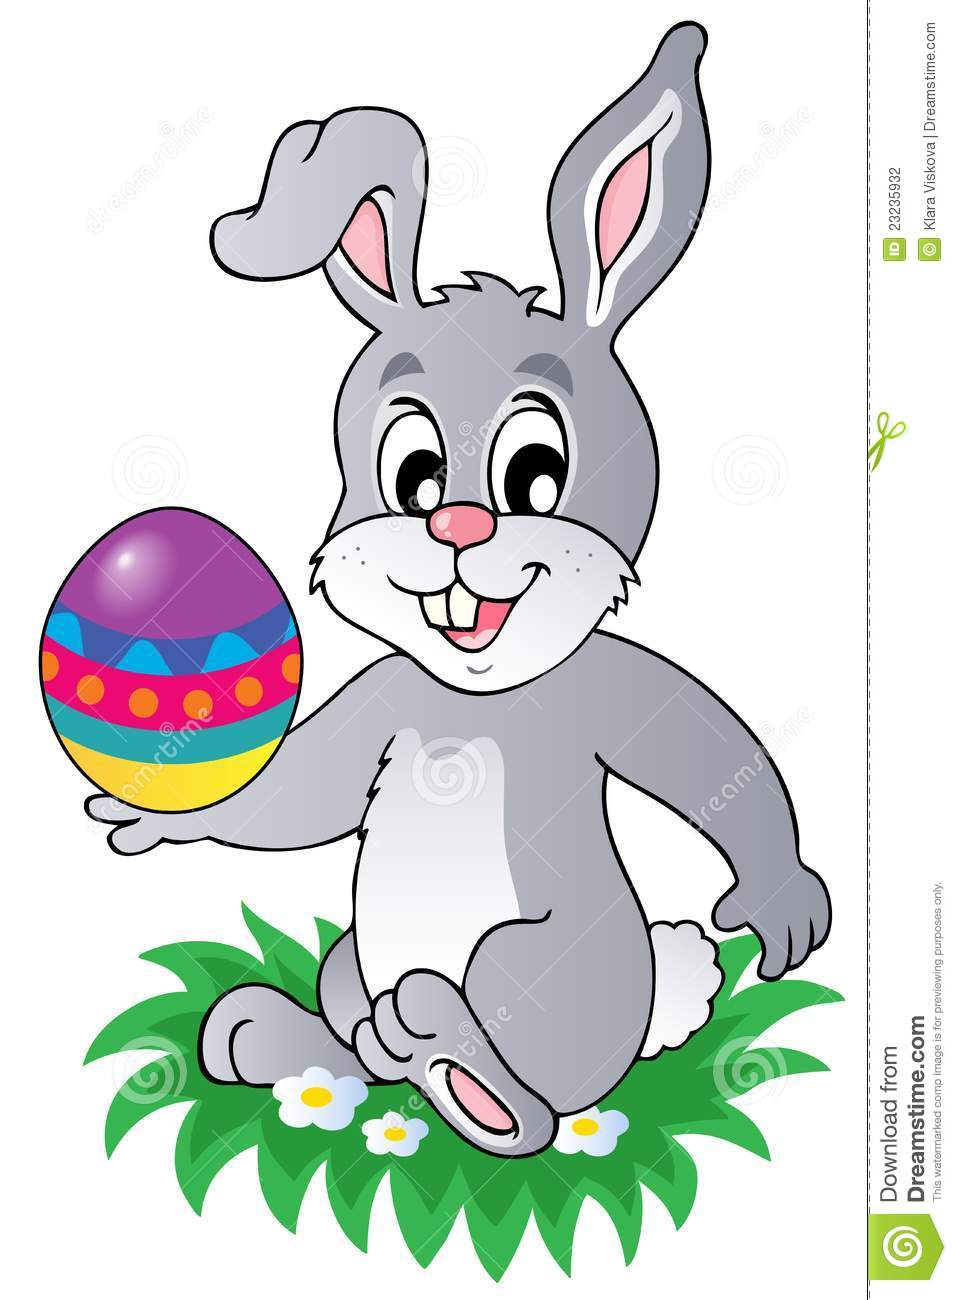 Easter Bunny Theme Image 1 Stock Photography.